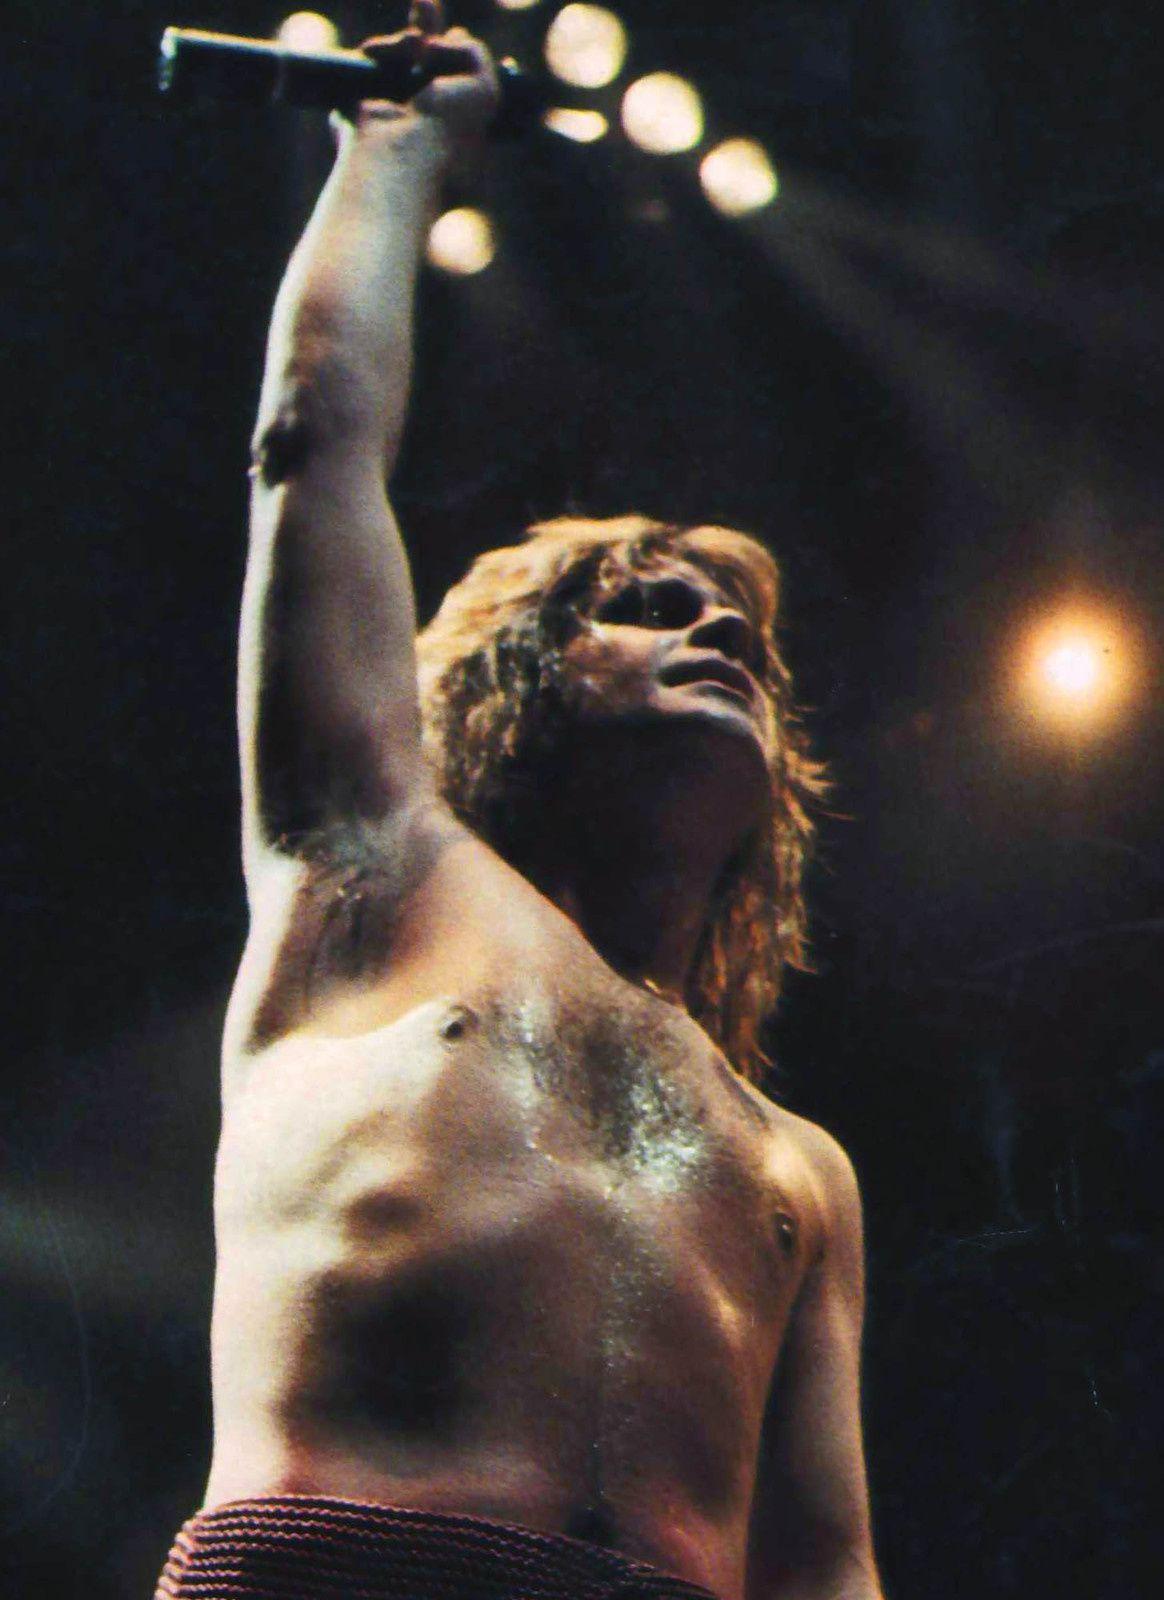 Ozzy Osbourne - 1982